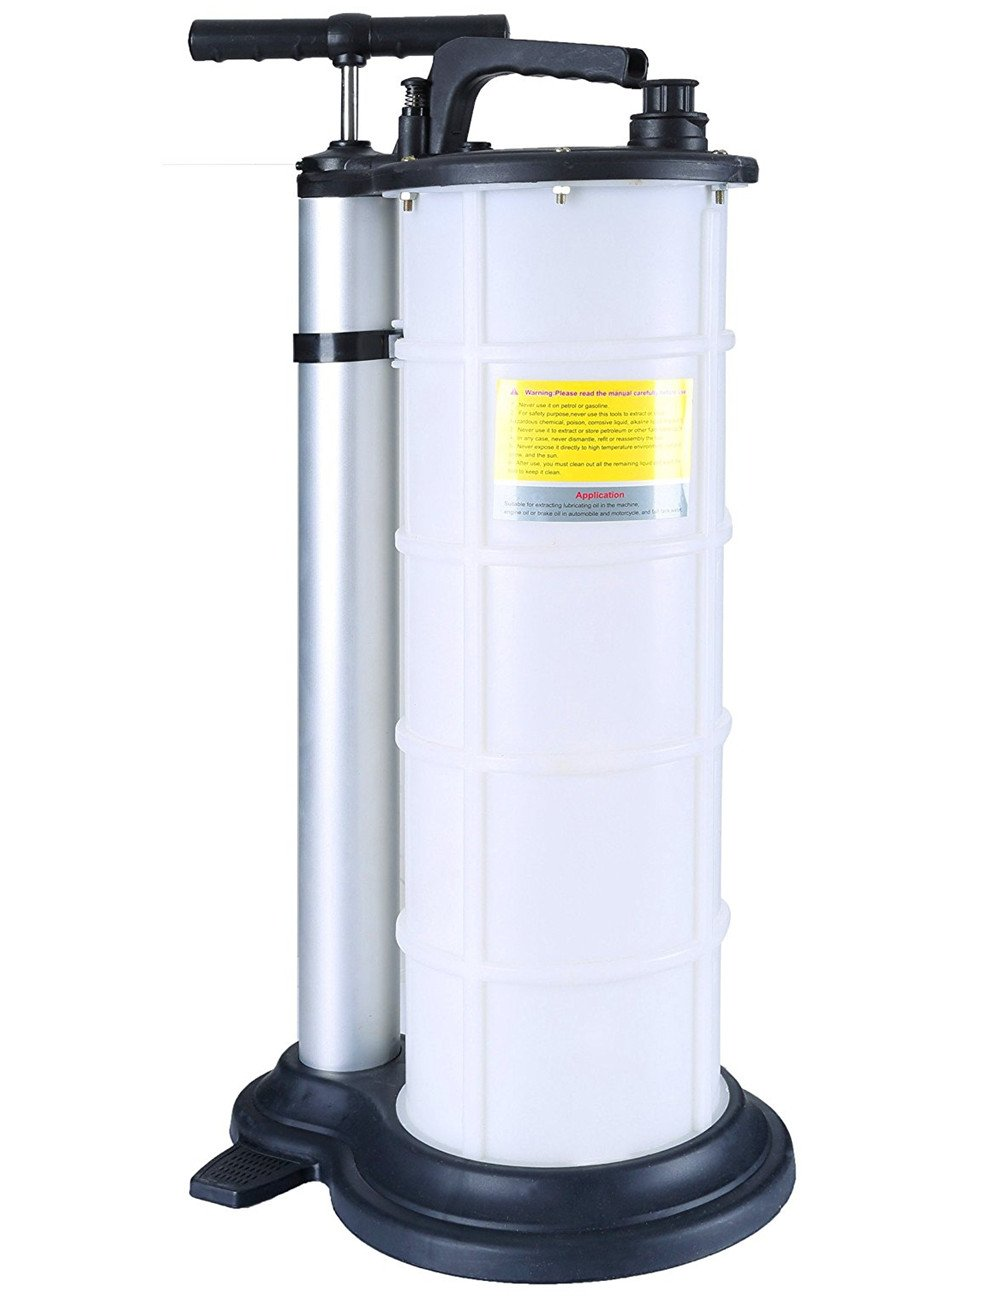 DASBET 9L Manual Fluid Extractor Engine Oil Coolant Brake Bleeder Transmission Remover Hand Pump